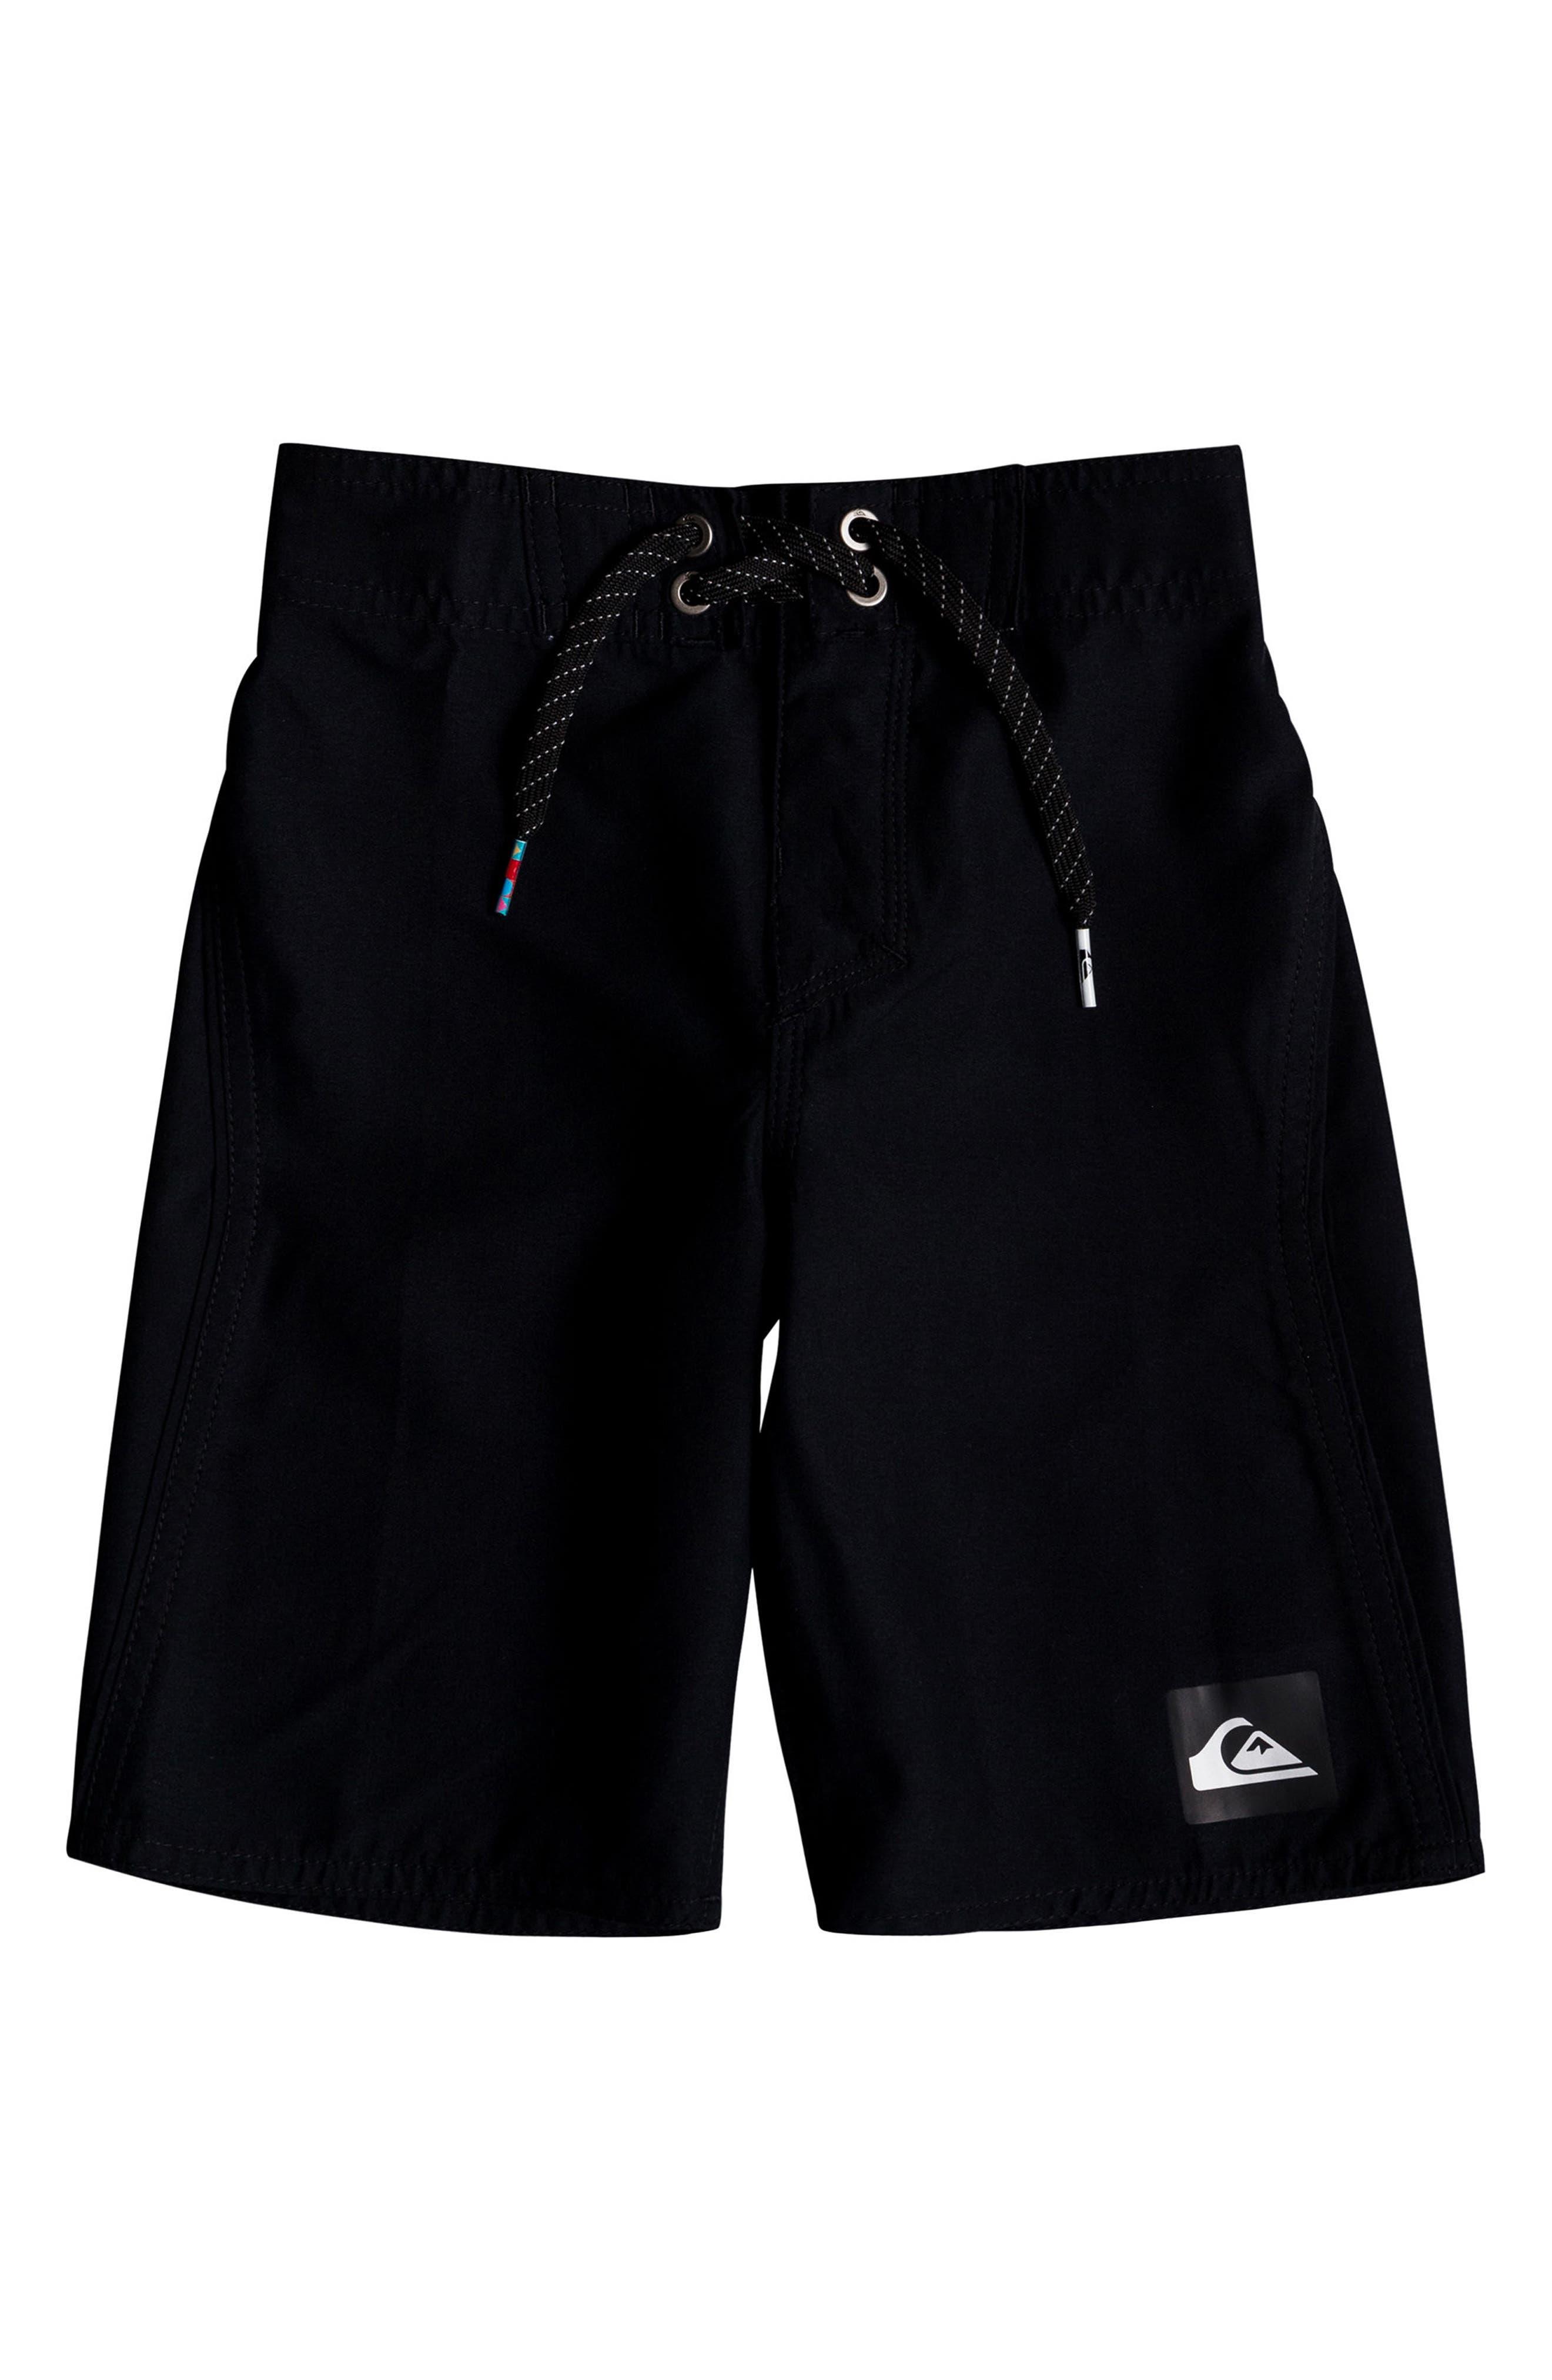 Highline Kaimana Board Shorts,                         Main,                         color, Black